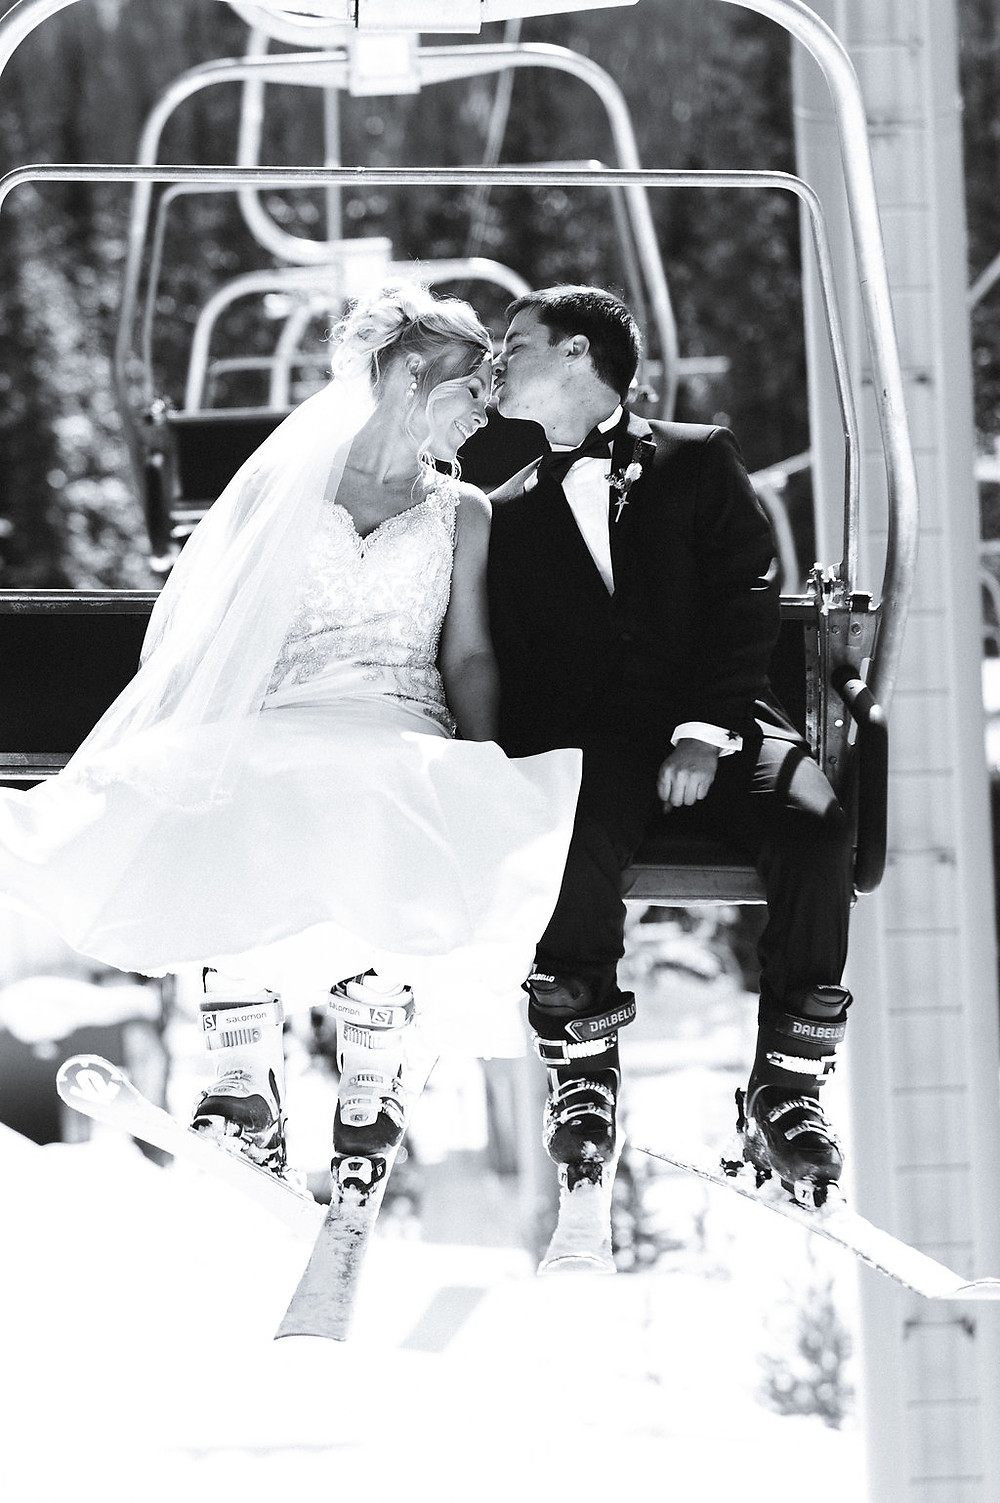 Colorado Winter Wedding - Colorado Winter Wedding Couple on a Ski Lift